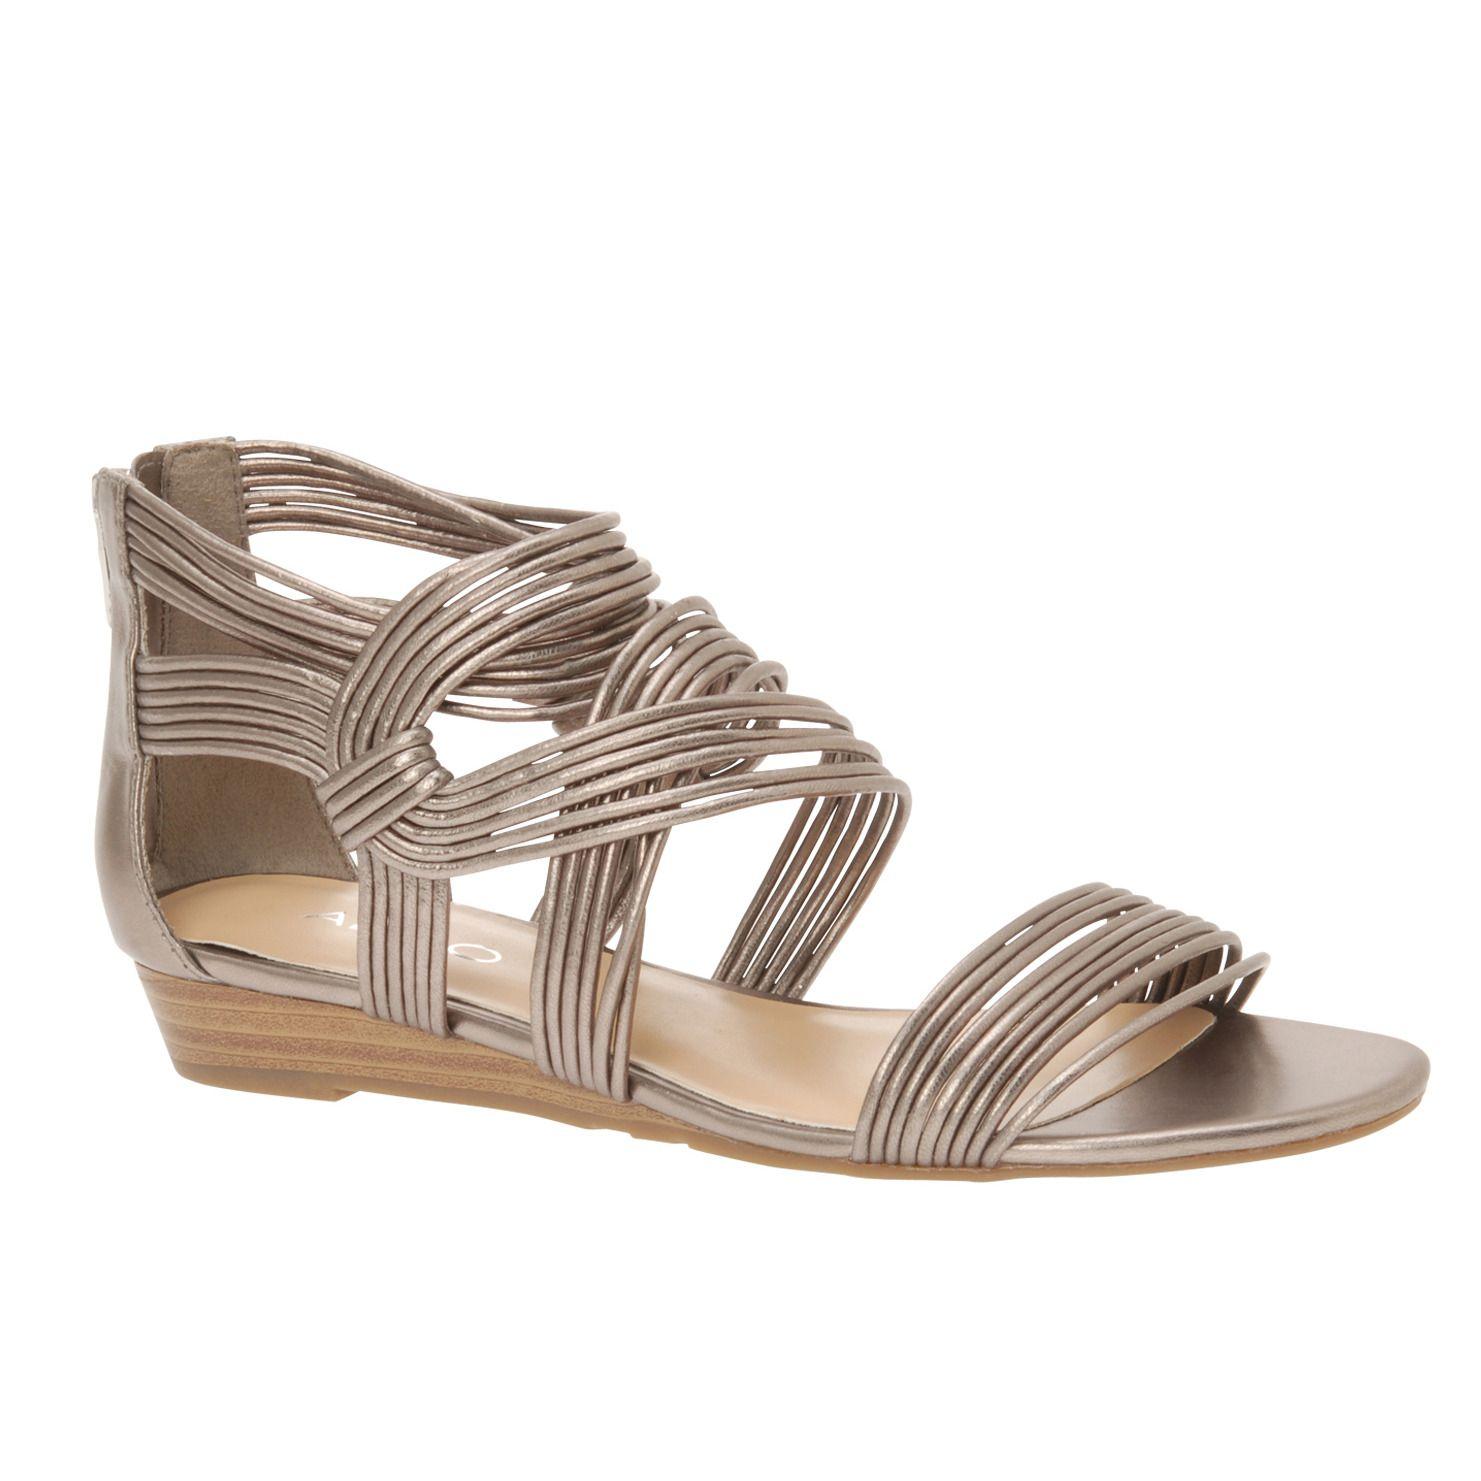 Bridal Shoes Aldo: Comfy Wedding Shoes, Shoes, Aldo Shoes